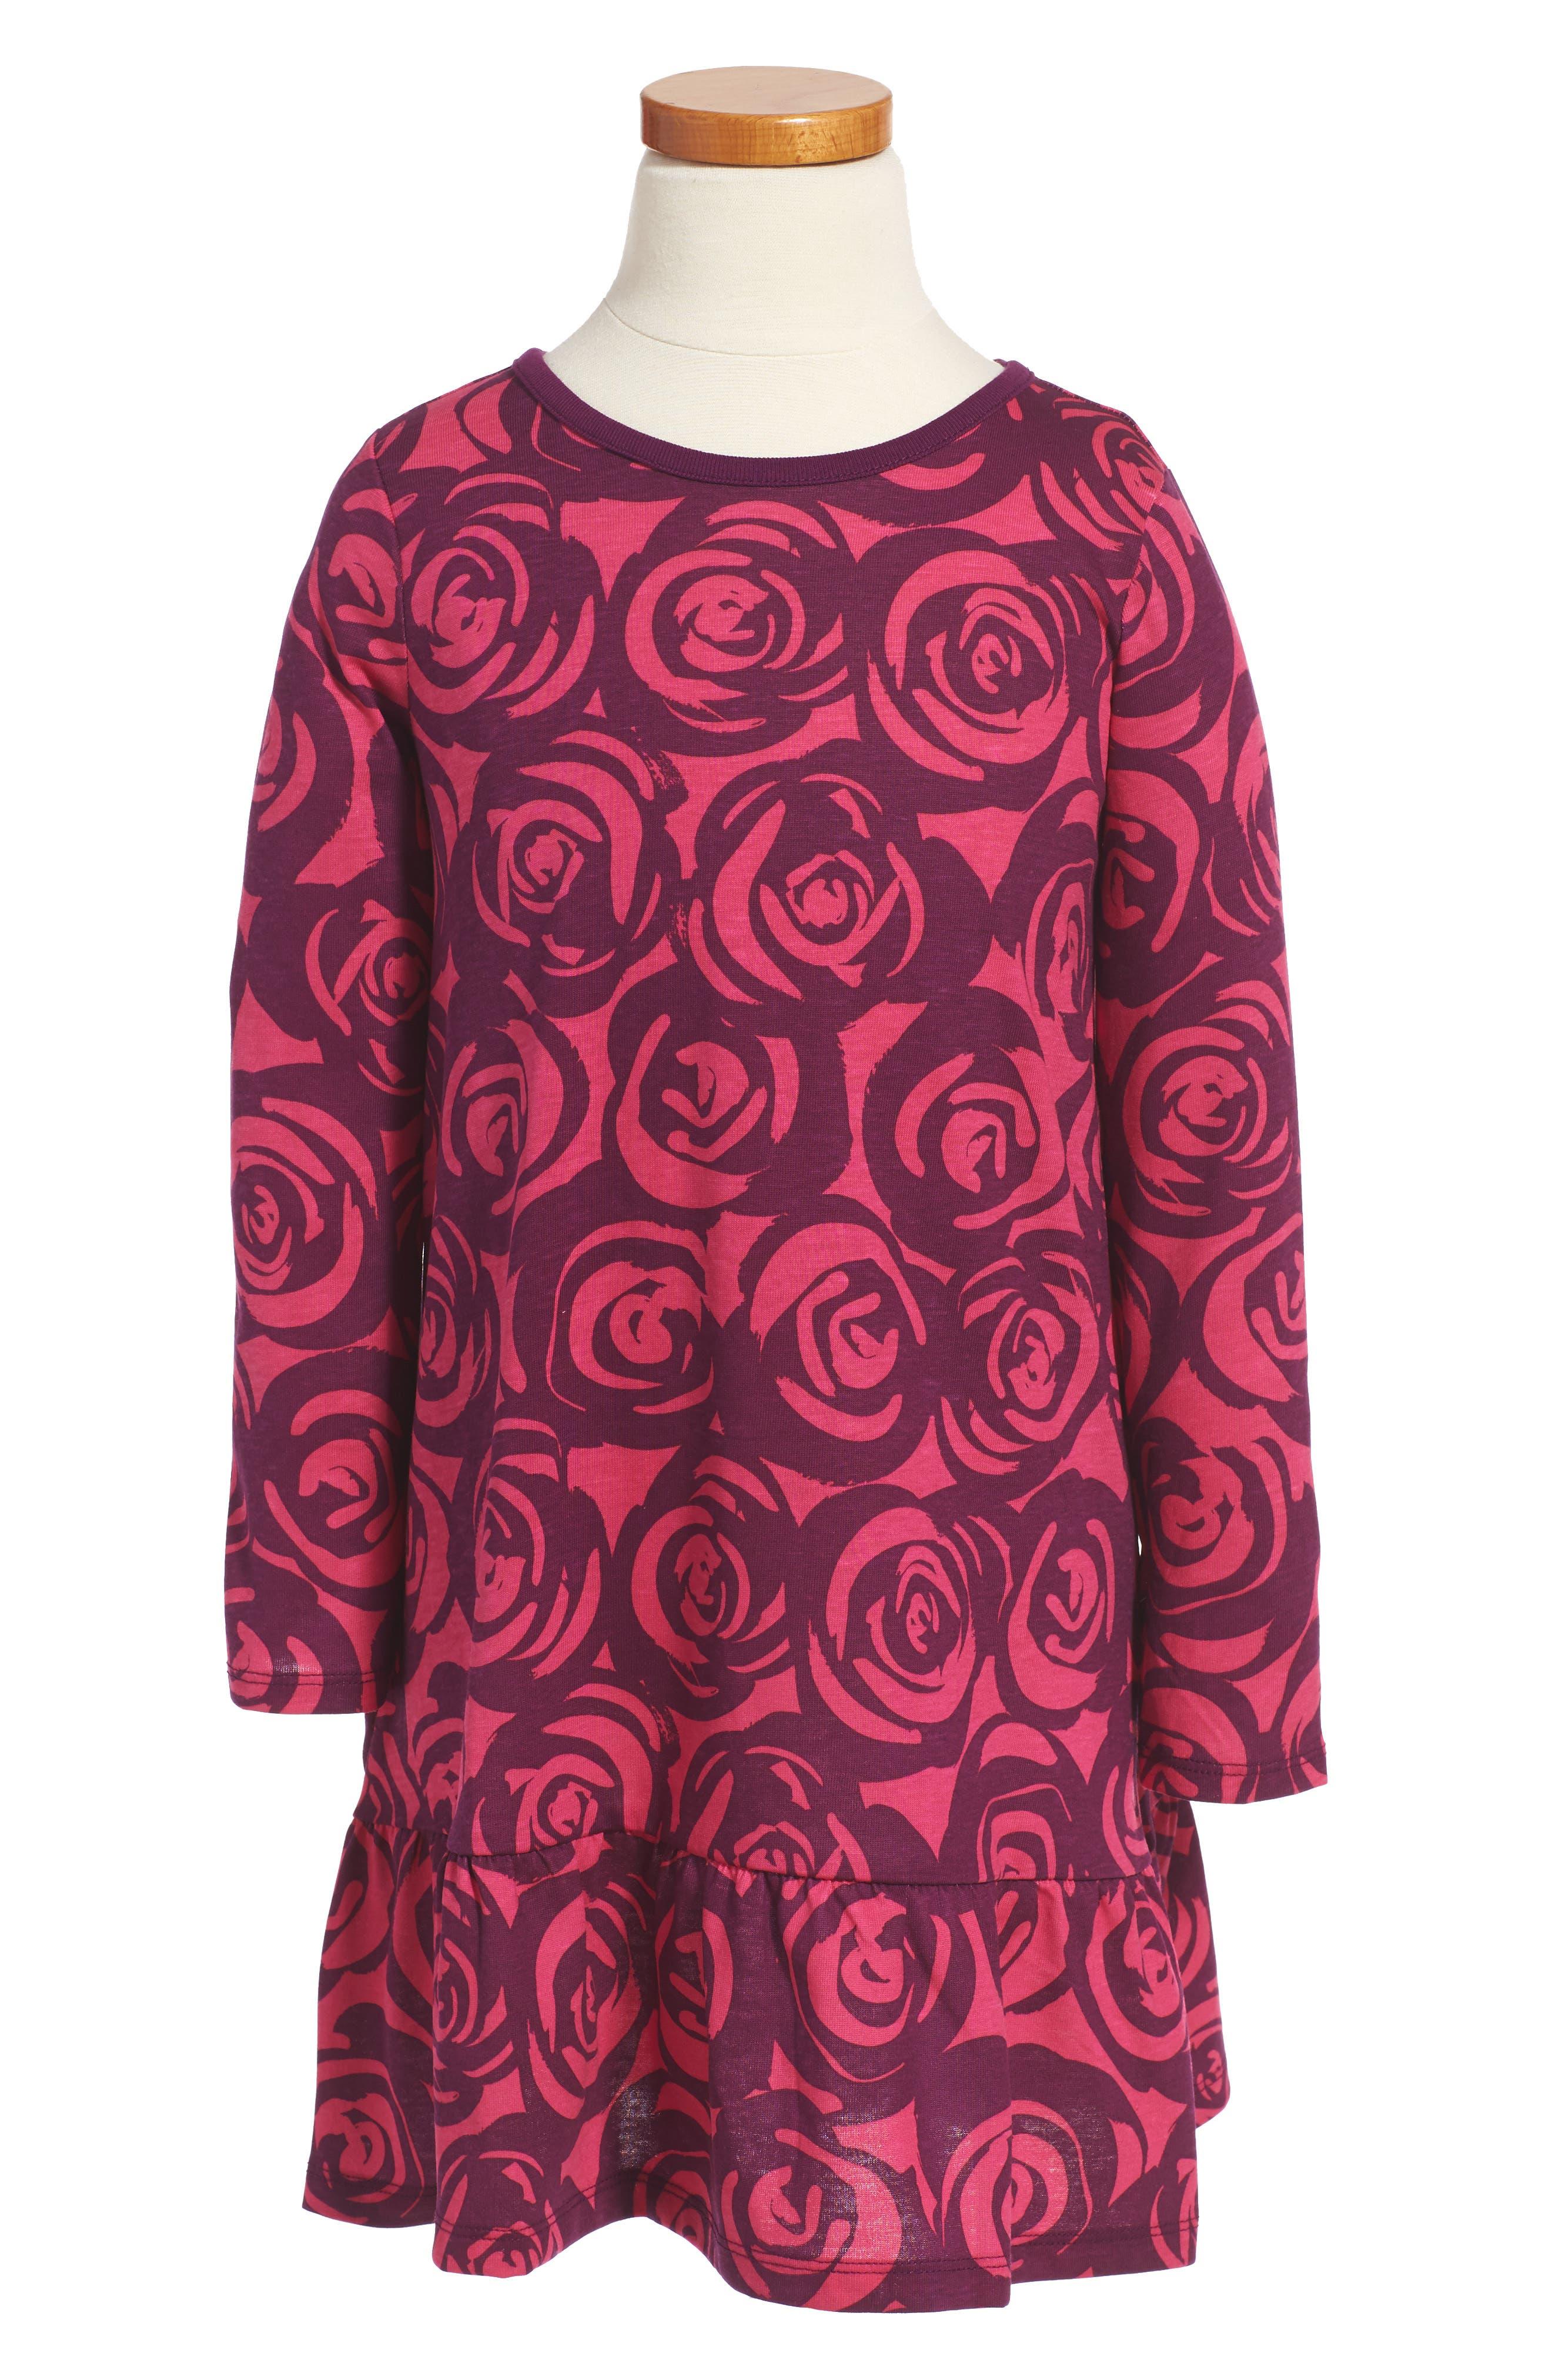 Rennie Rose Ruffle Dress,                         Main,                         color, Pink